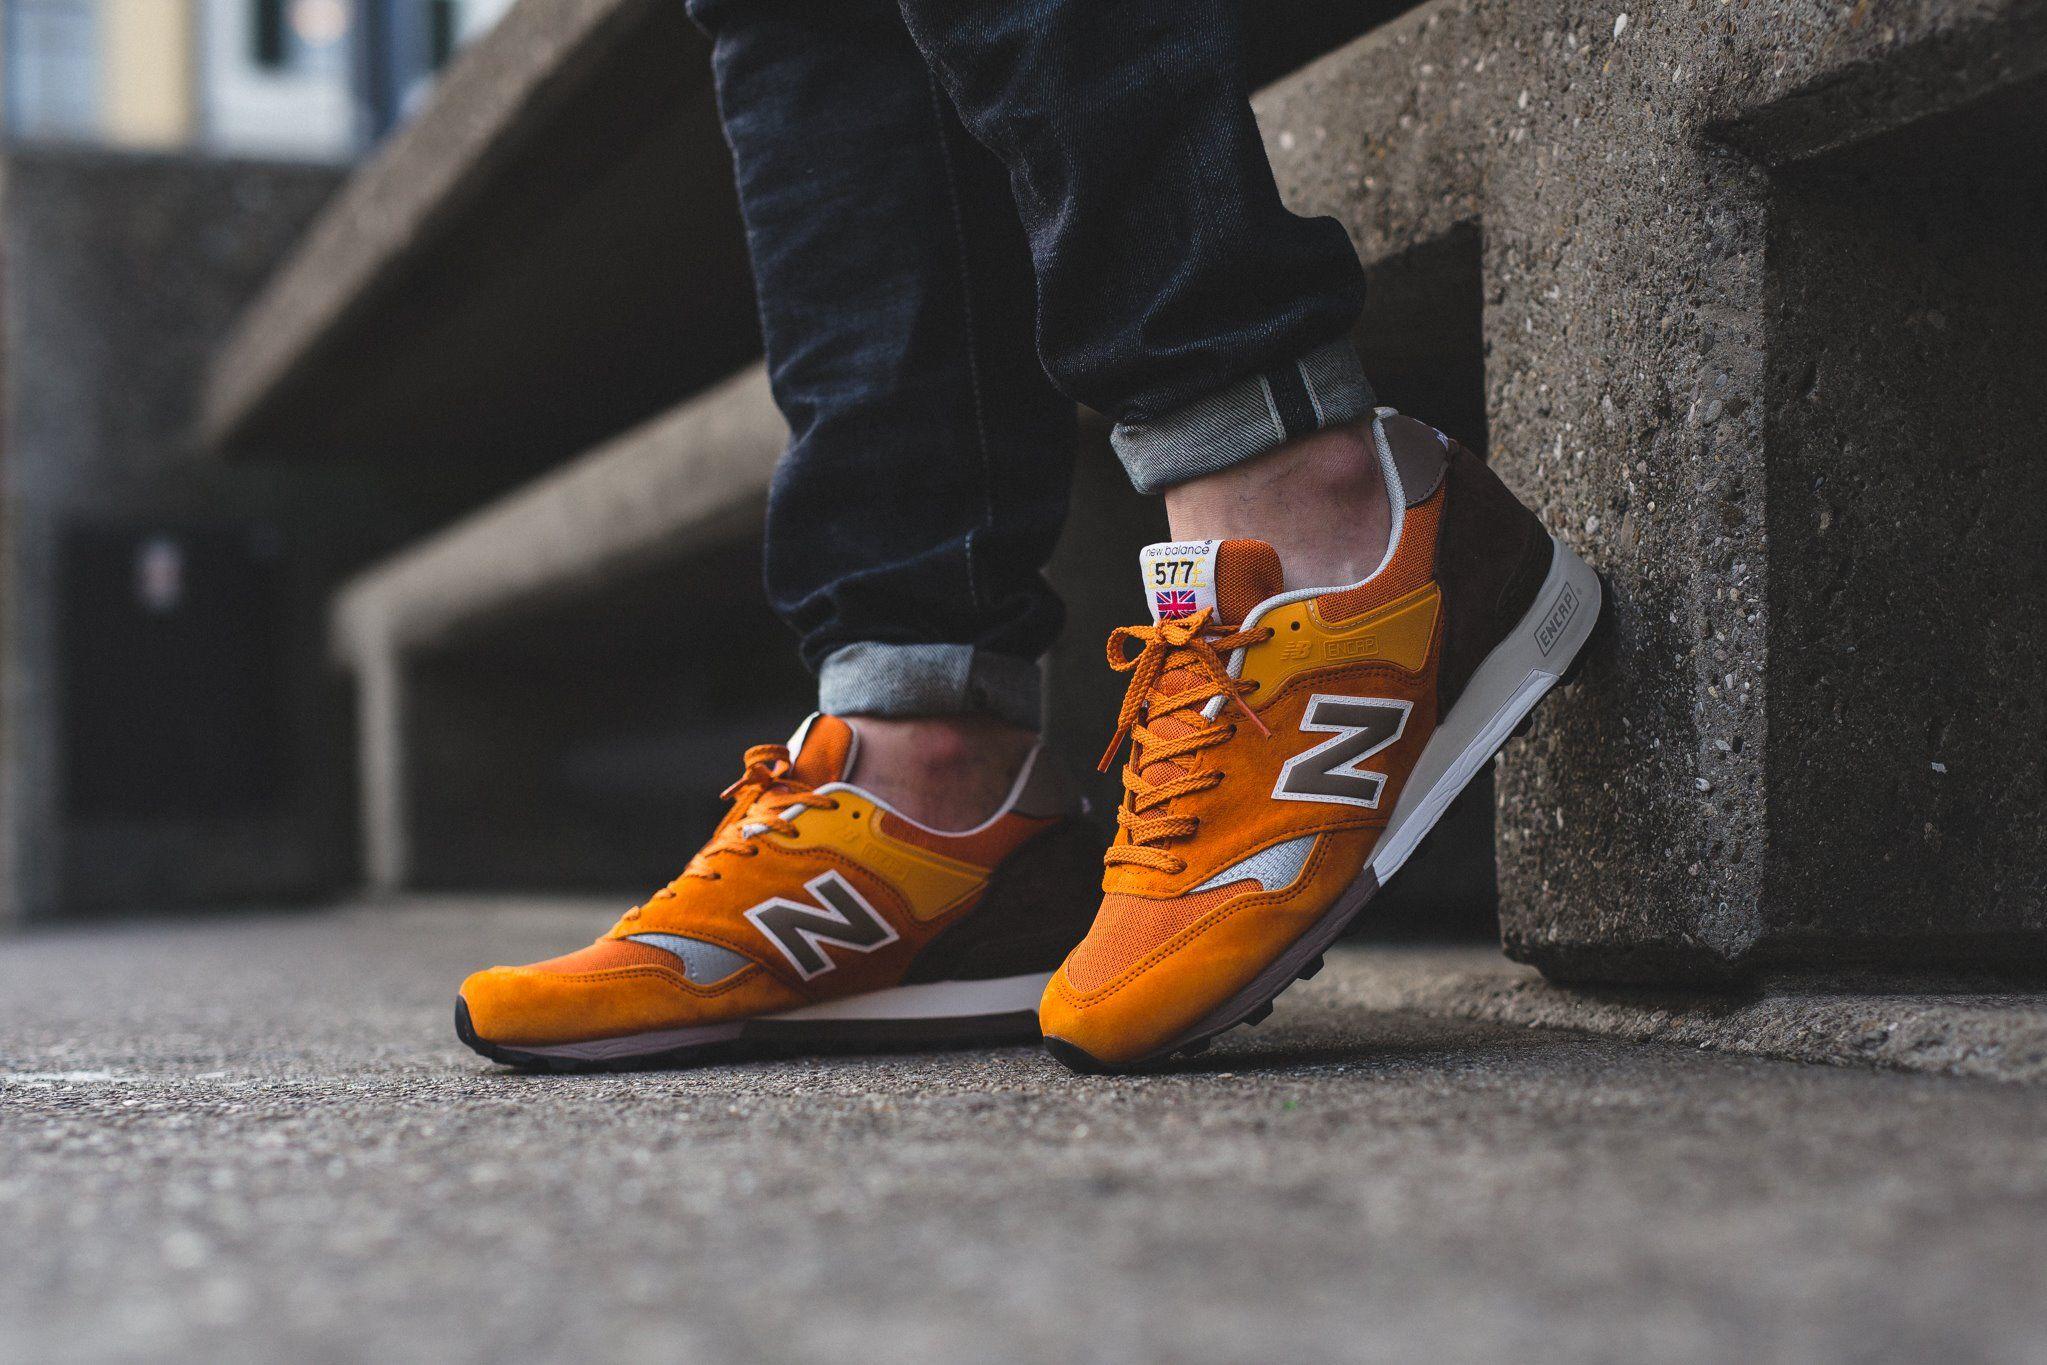 New Balance 577-Orange-1